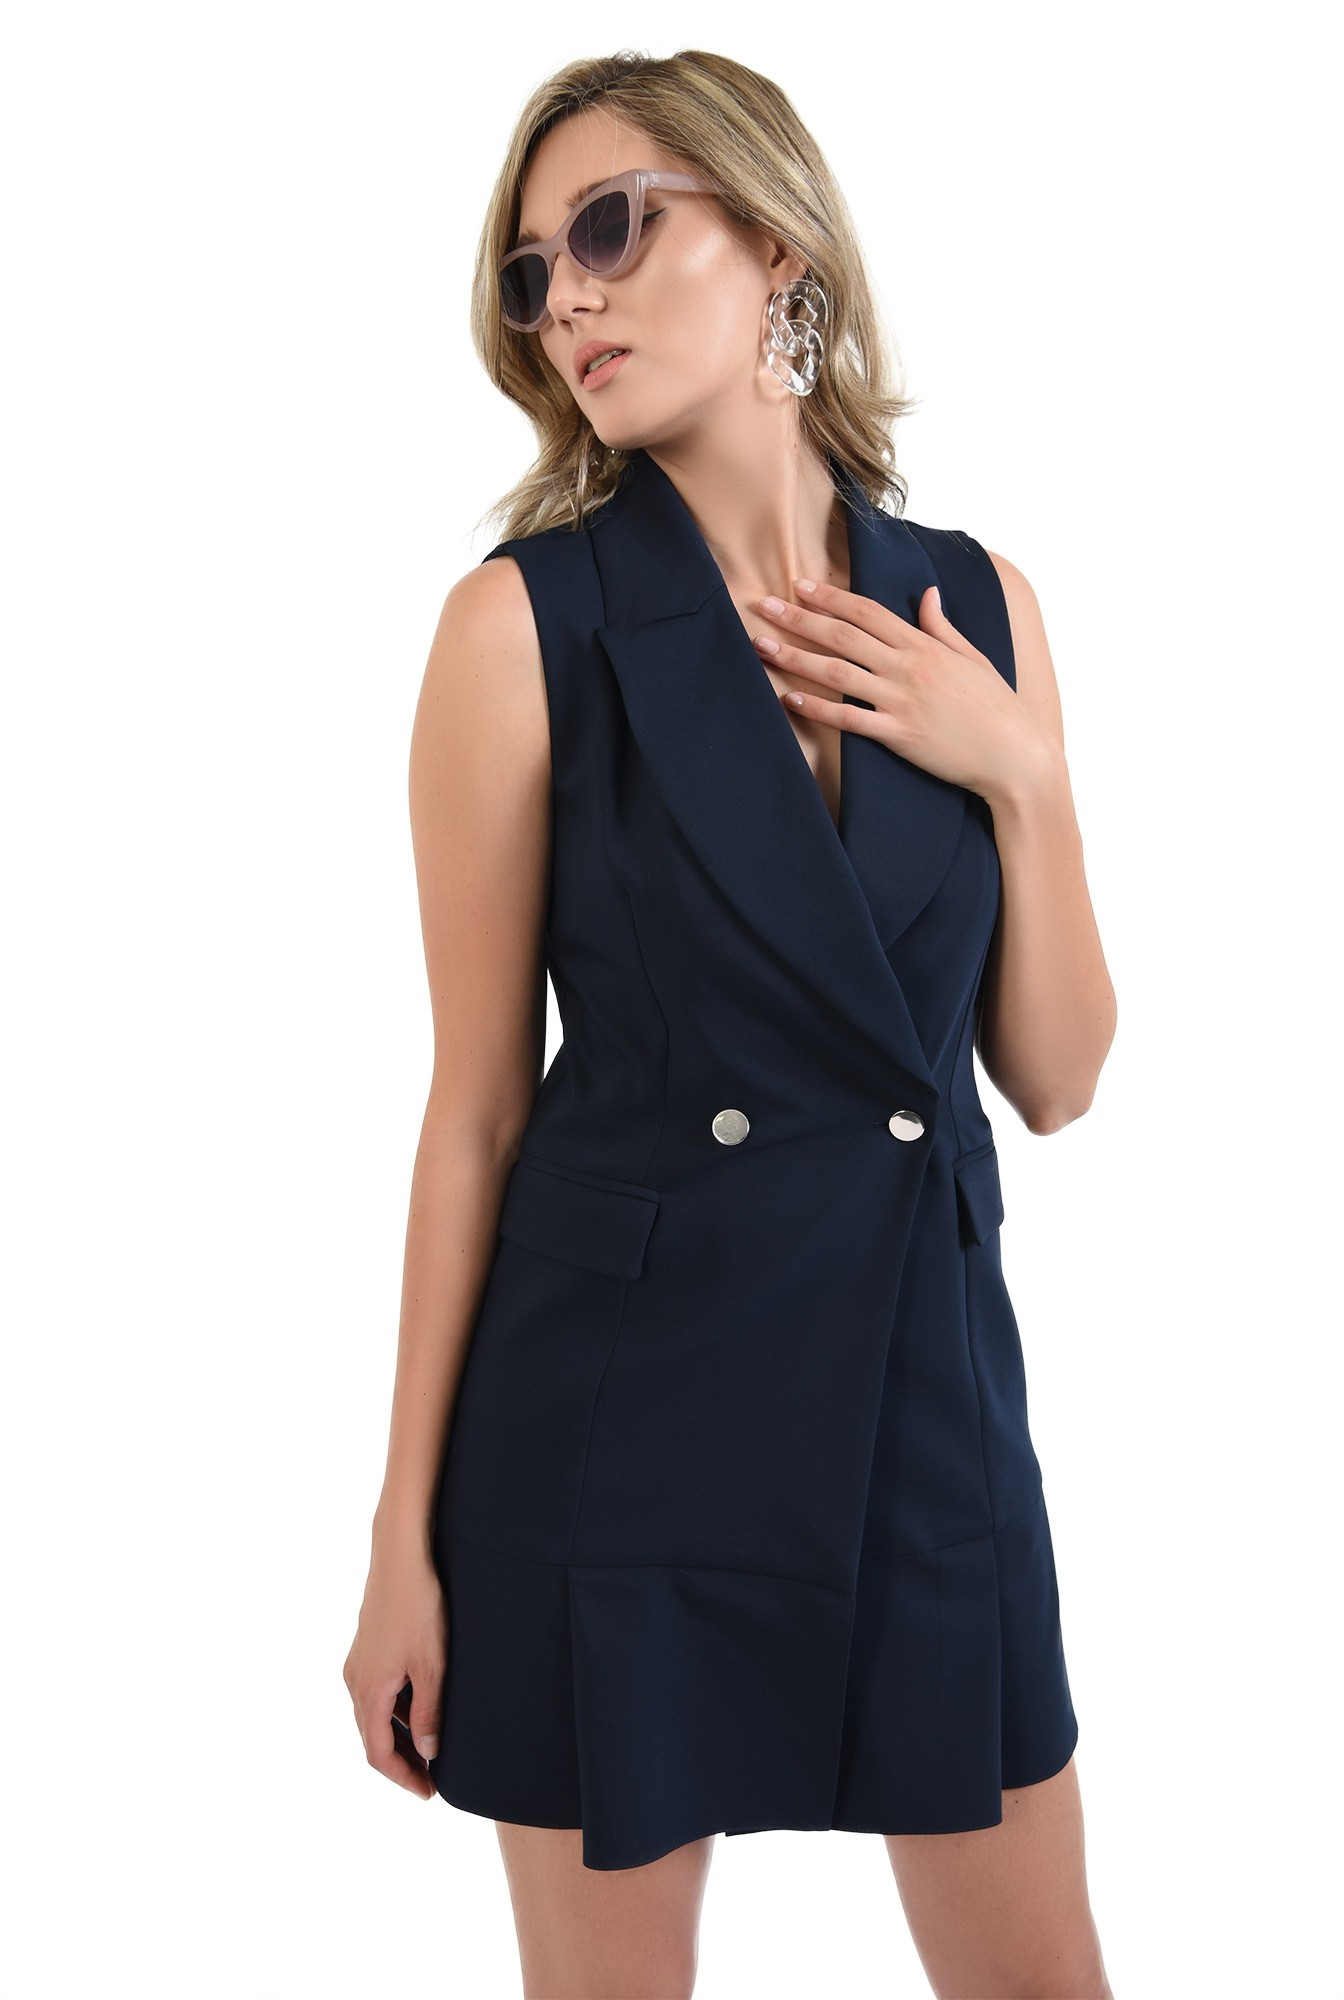 360 - rochie bleumarin, scurta, tip sacou, Poema